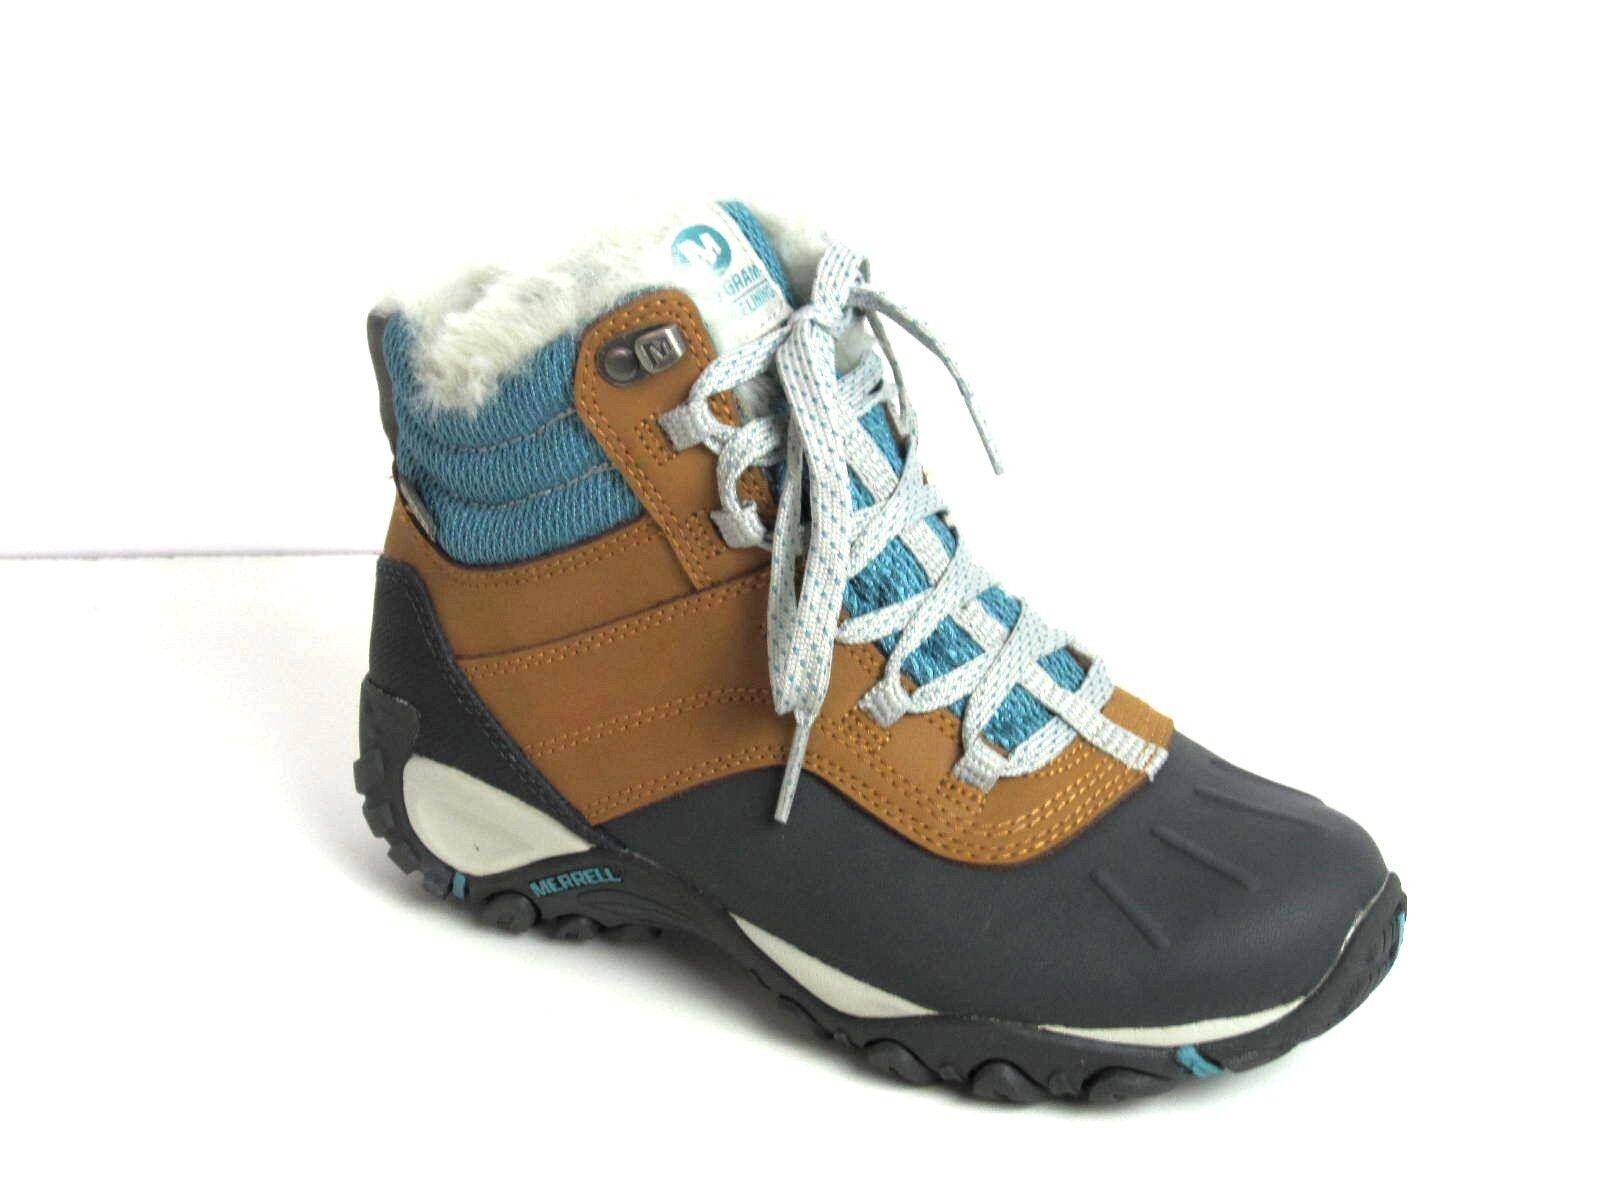 Merrell Atmost Mid WTPF Womens Brown sugar/Ice  Boots Sz 5.5 M